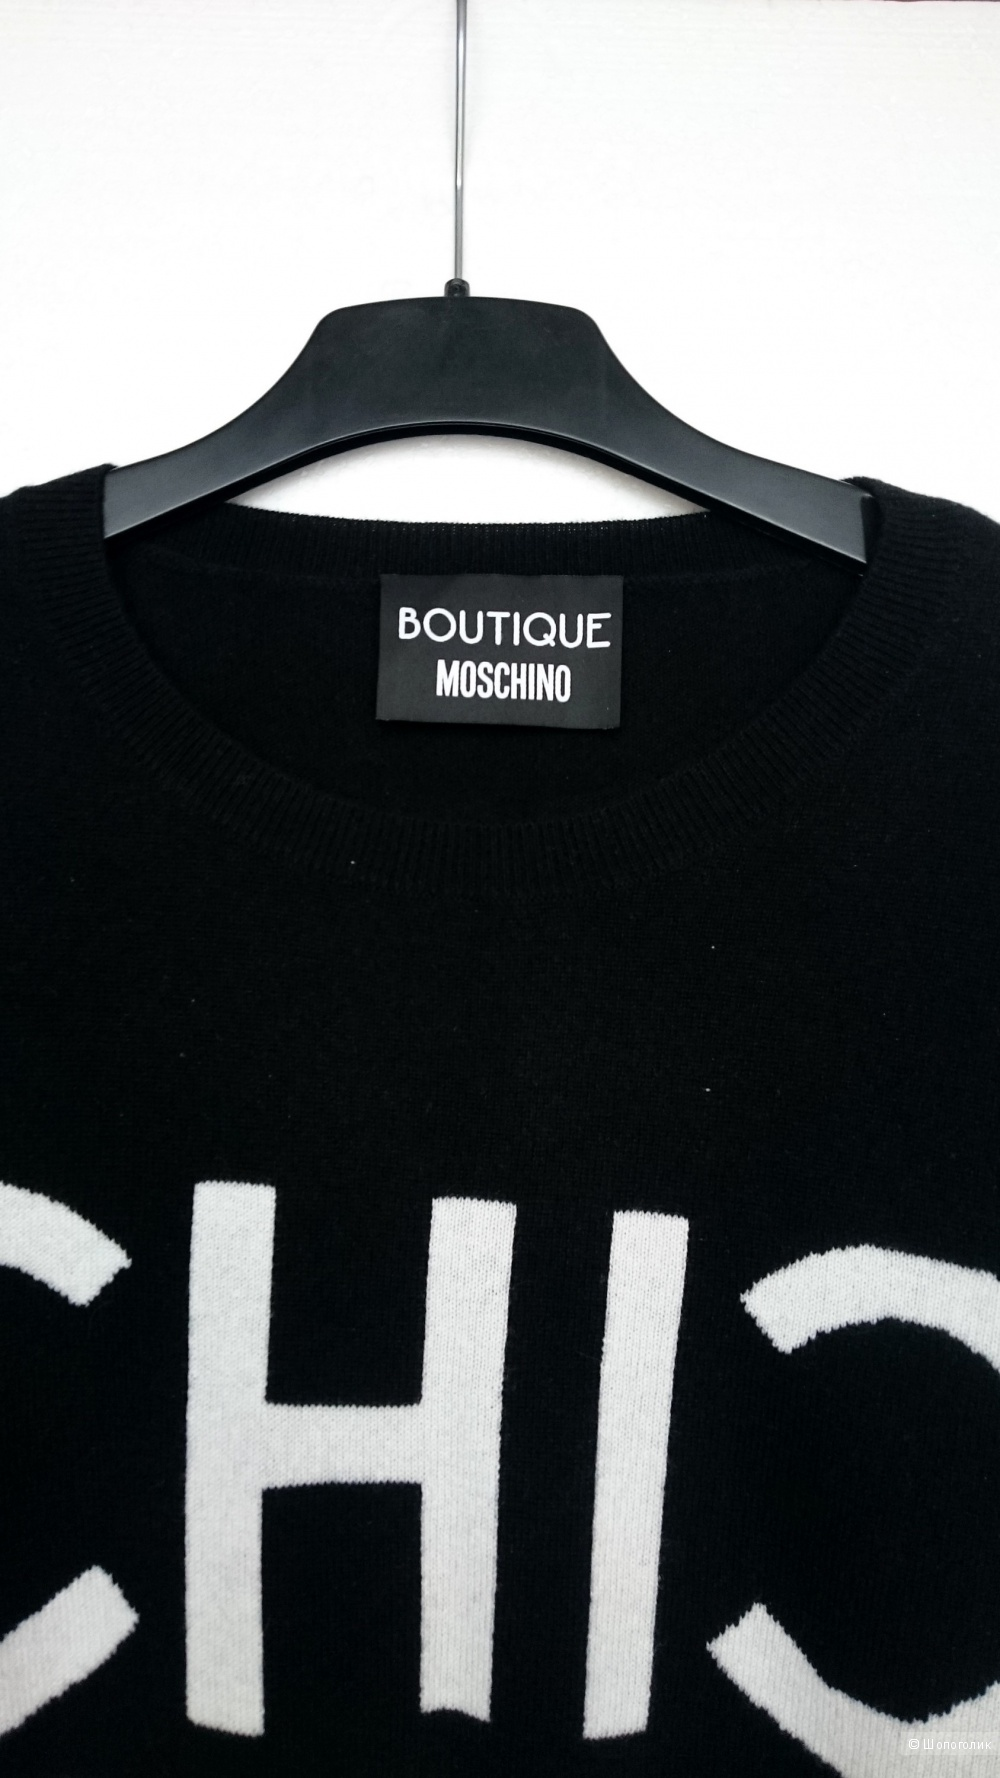 Джемпер Boutique Moschino размер 46